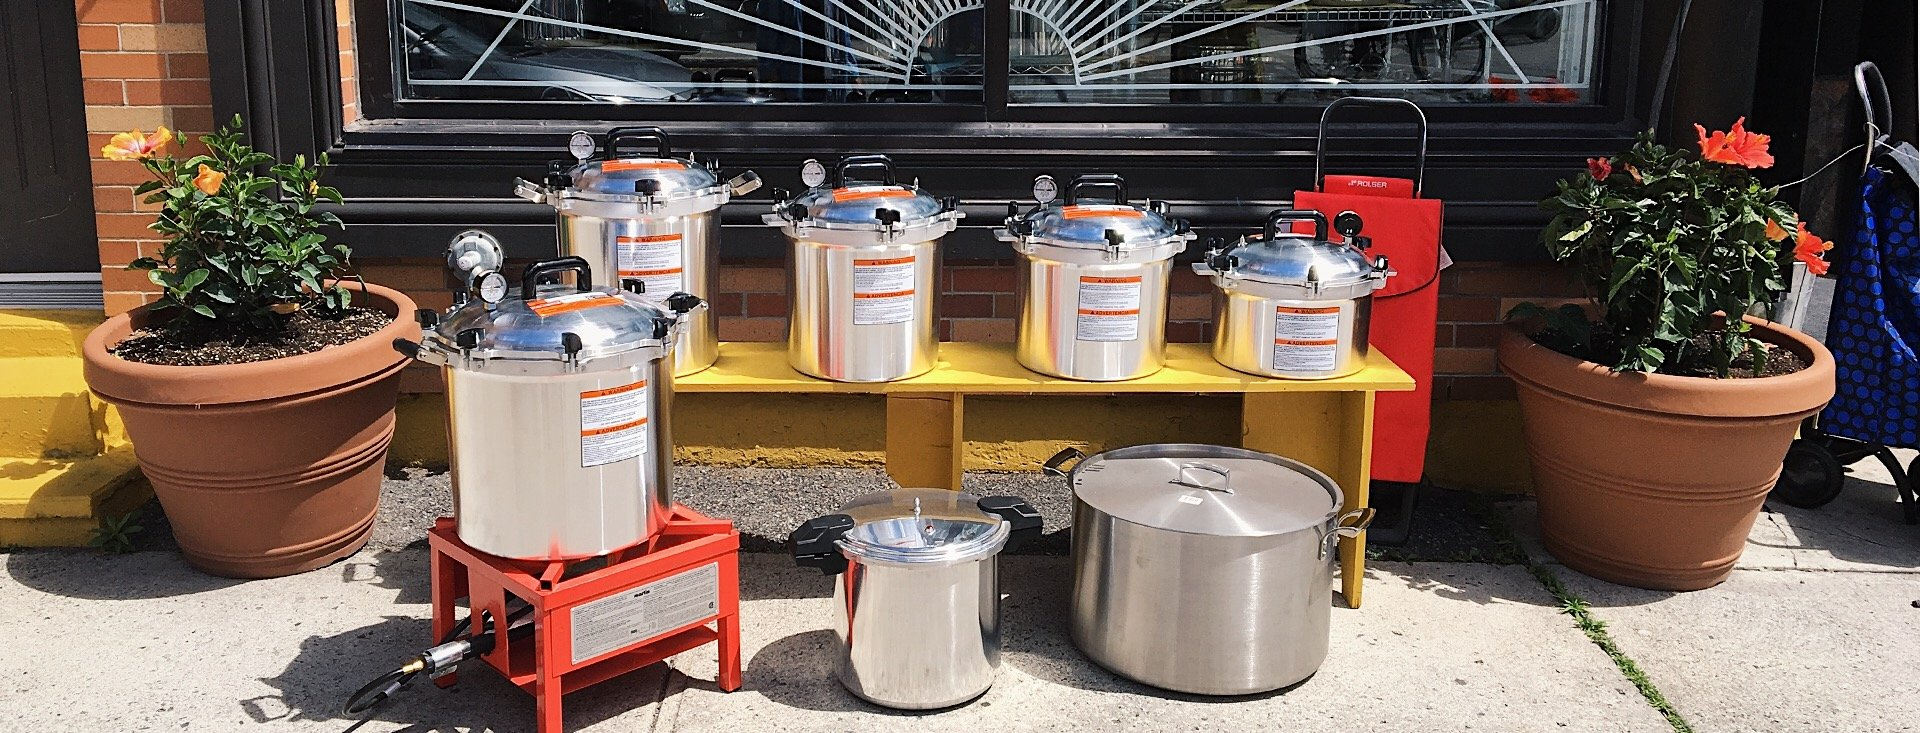 Kitchen Supply Store Little Italy